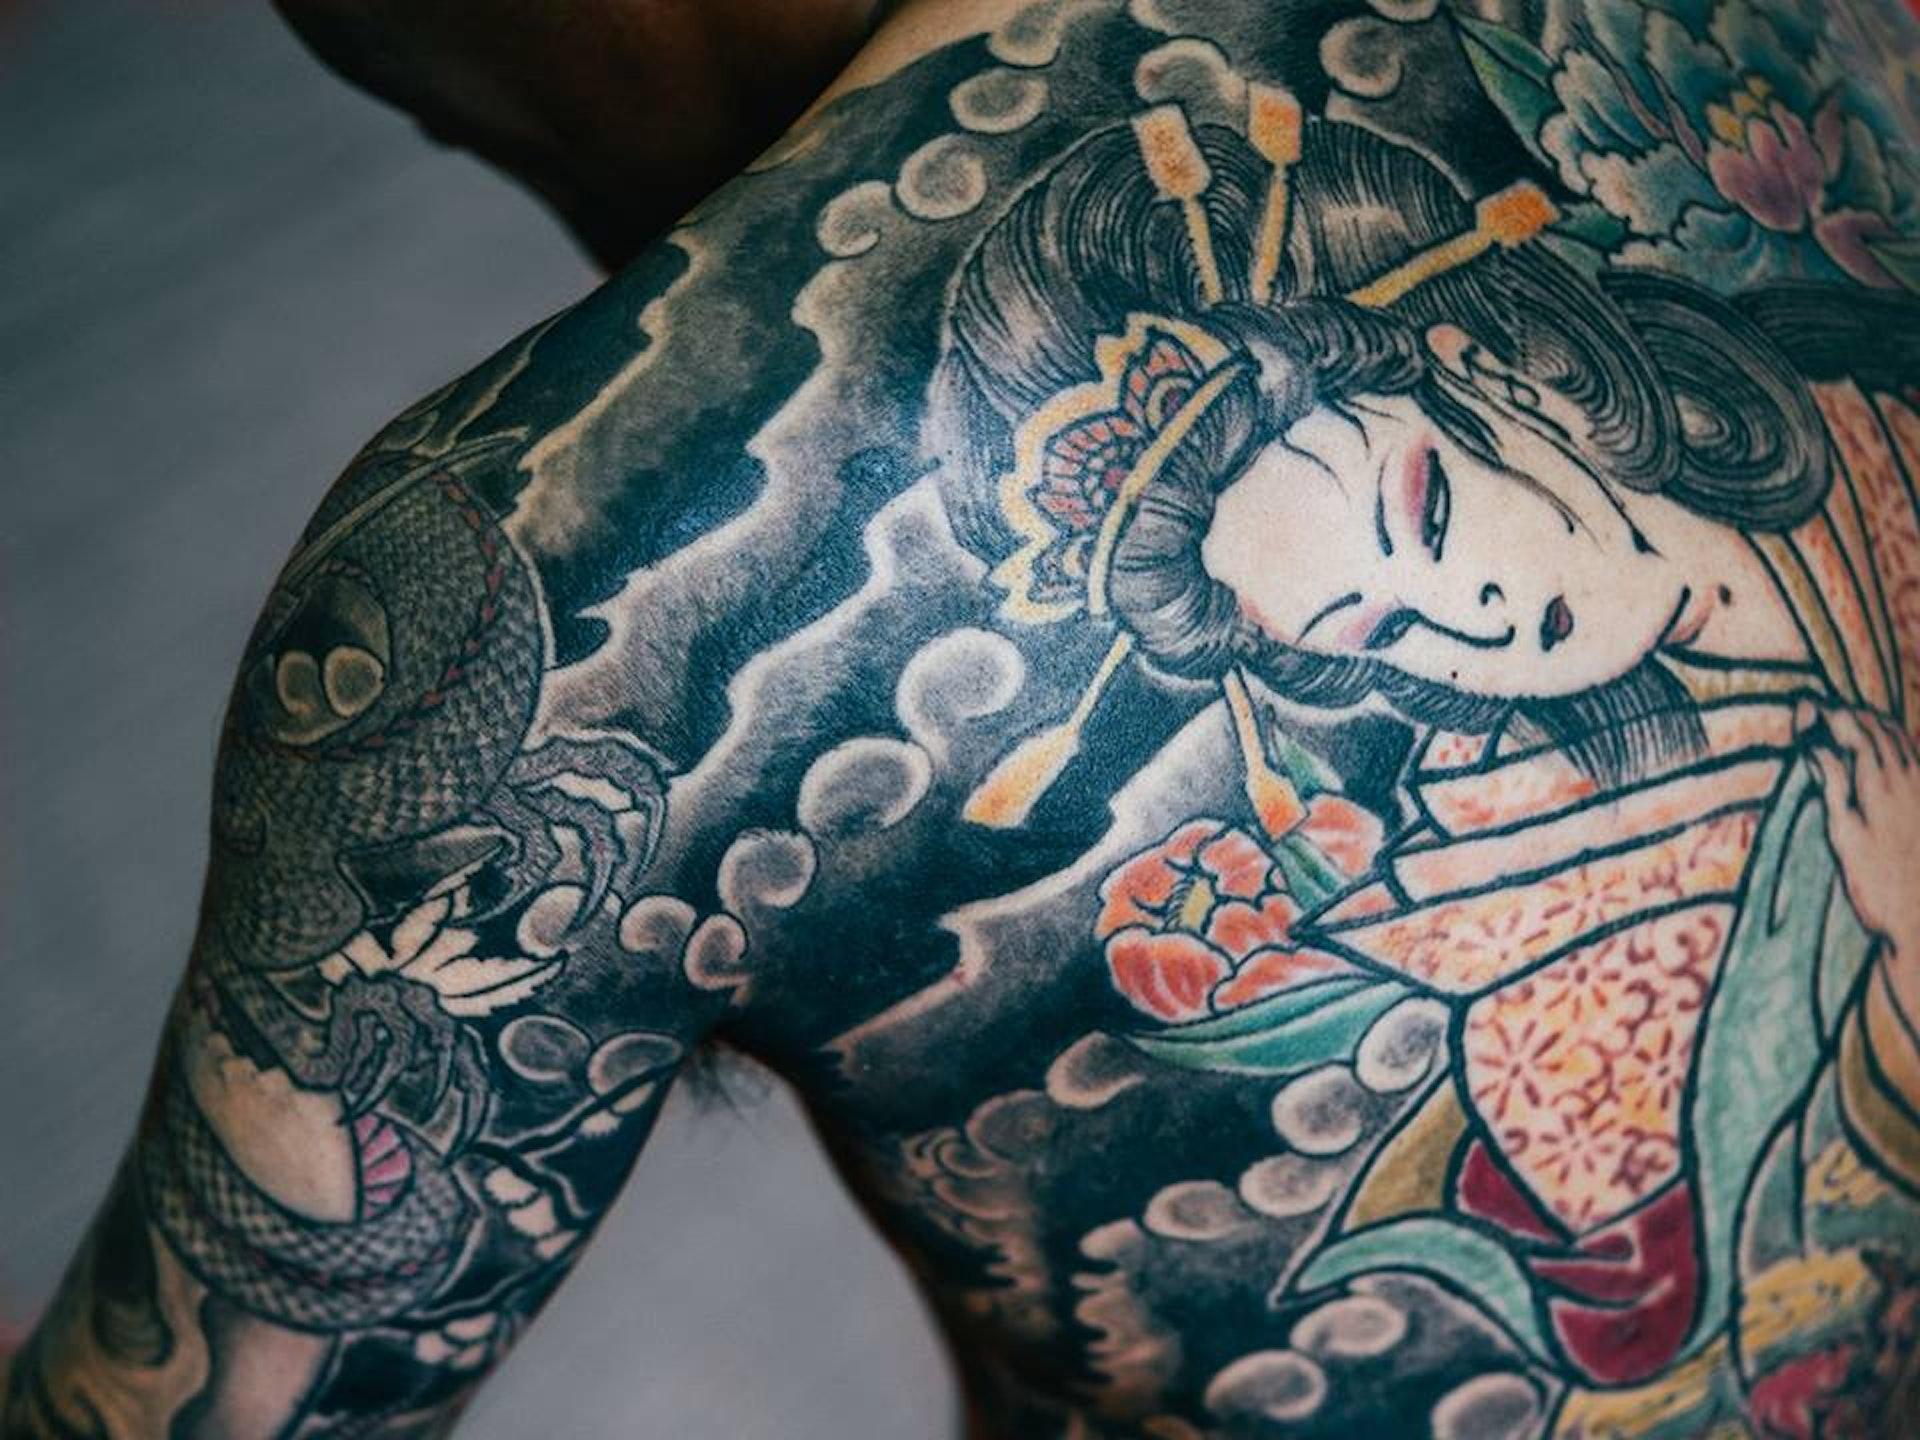 Ink Stigma The Japanese Tattoo Artists Fighting Back